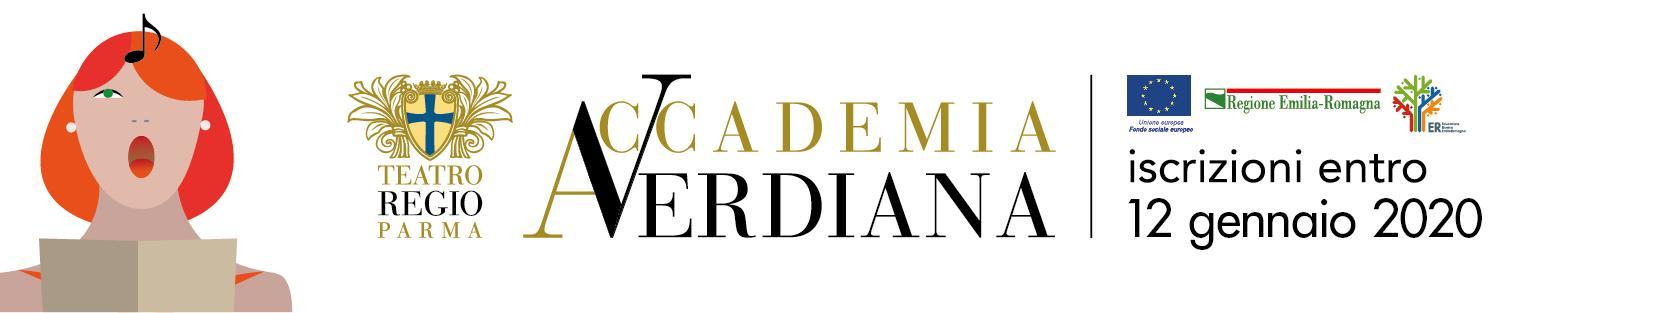 accademiaverdiana2020